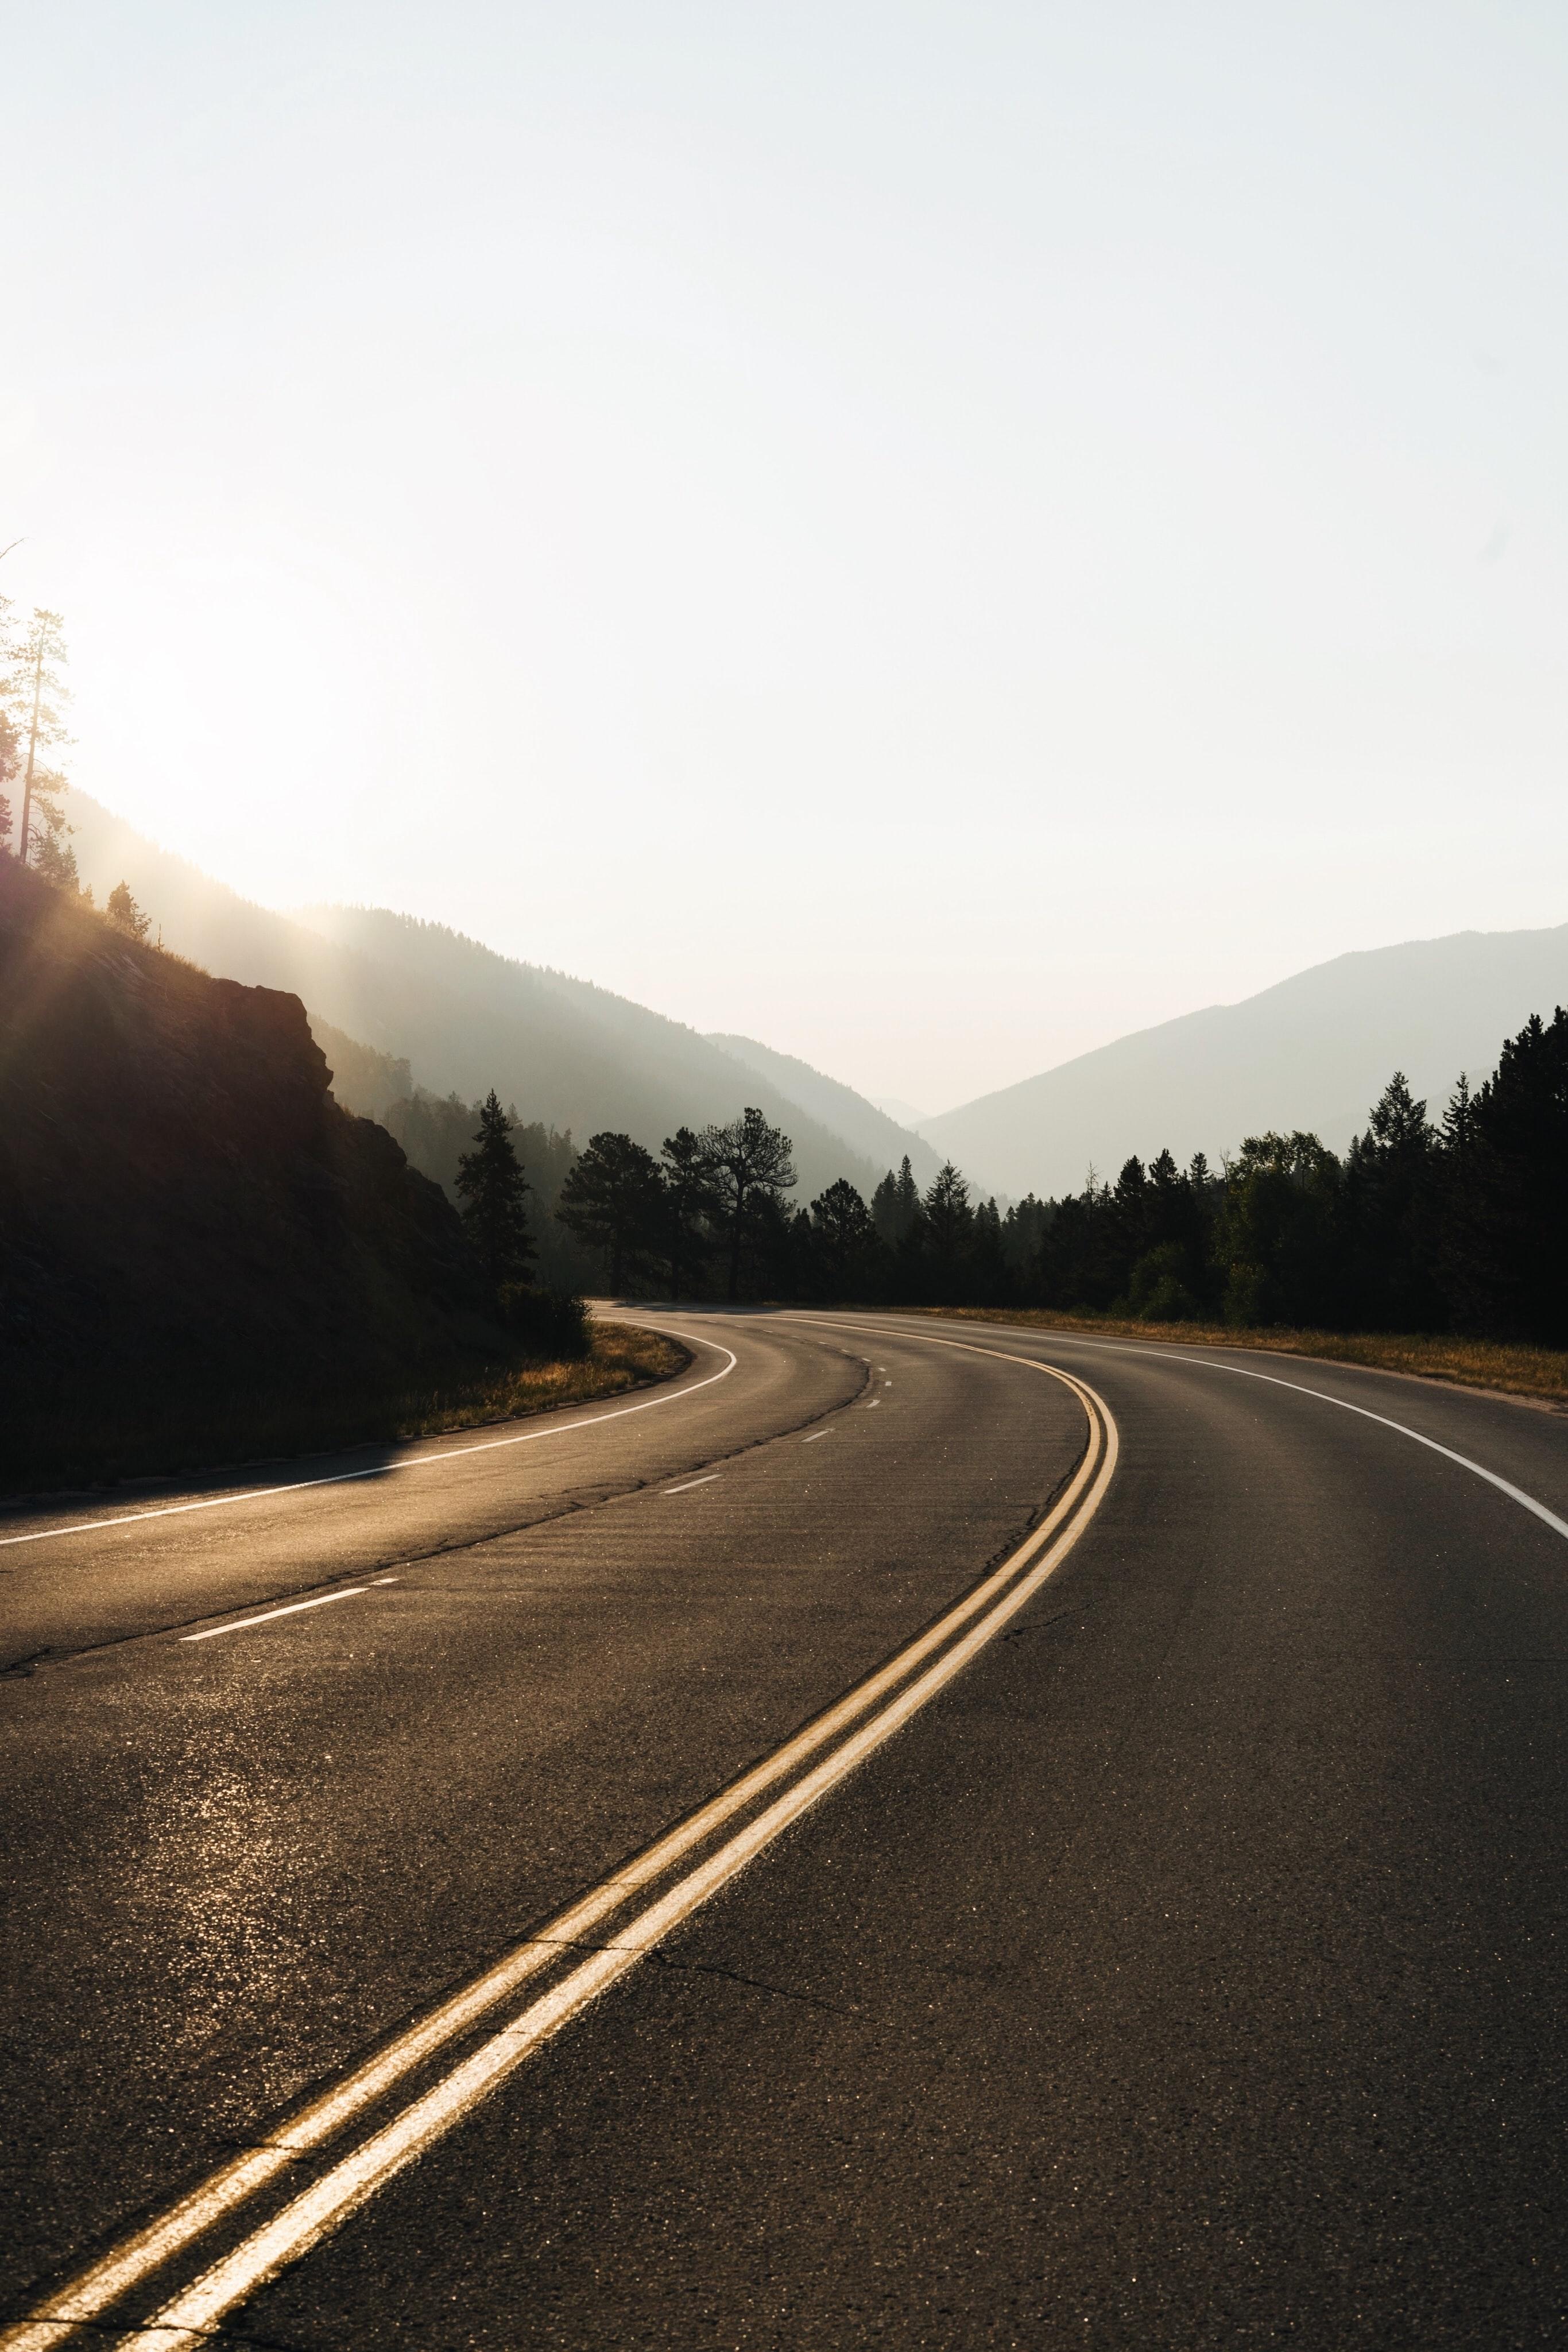 20 Road Backgrounds Hq Download Free Images On Unsplash